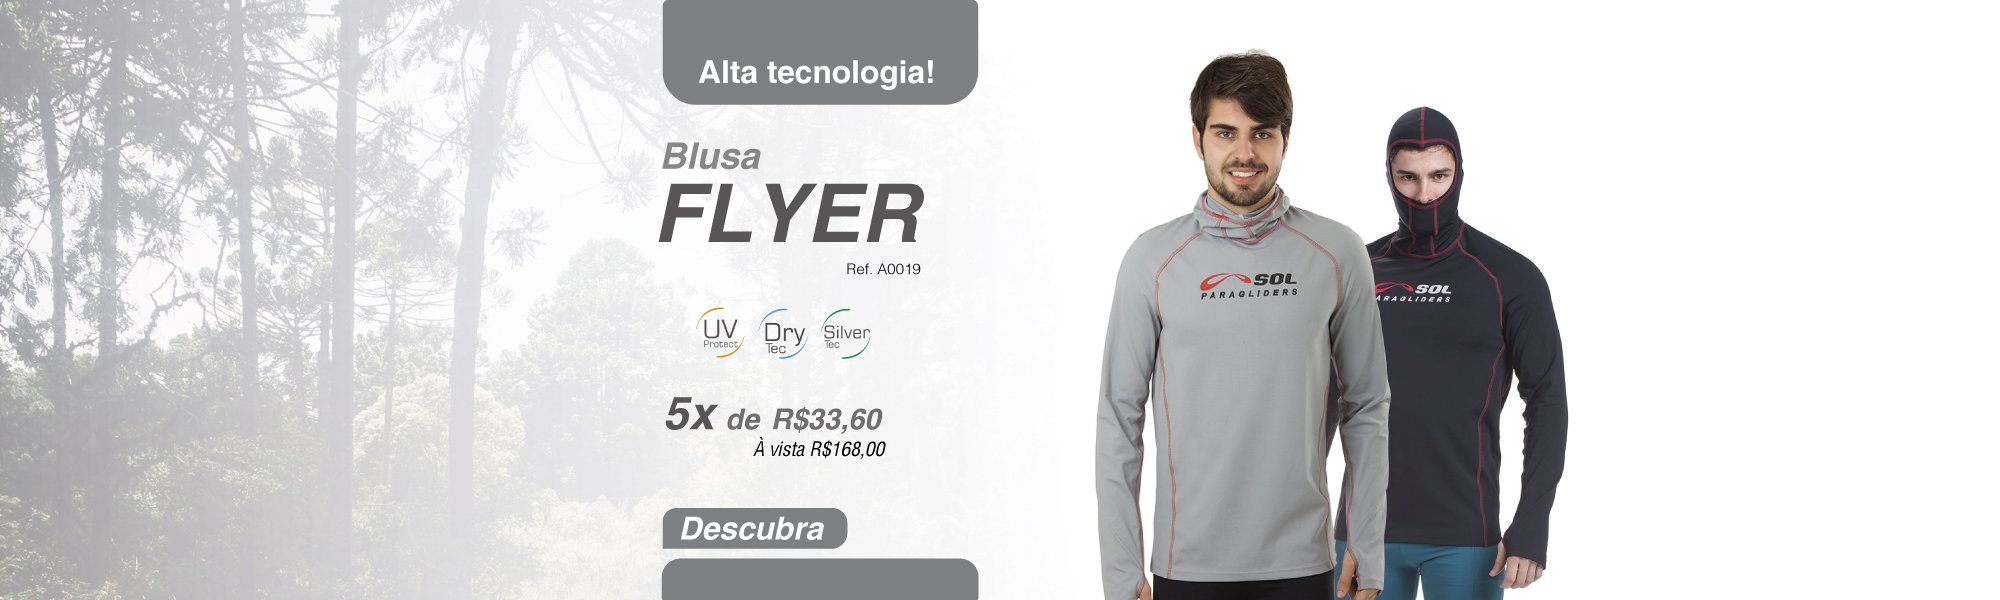 Blusa Flyer